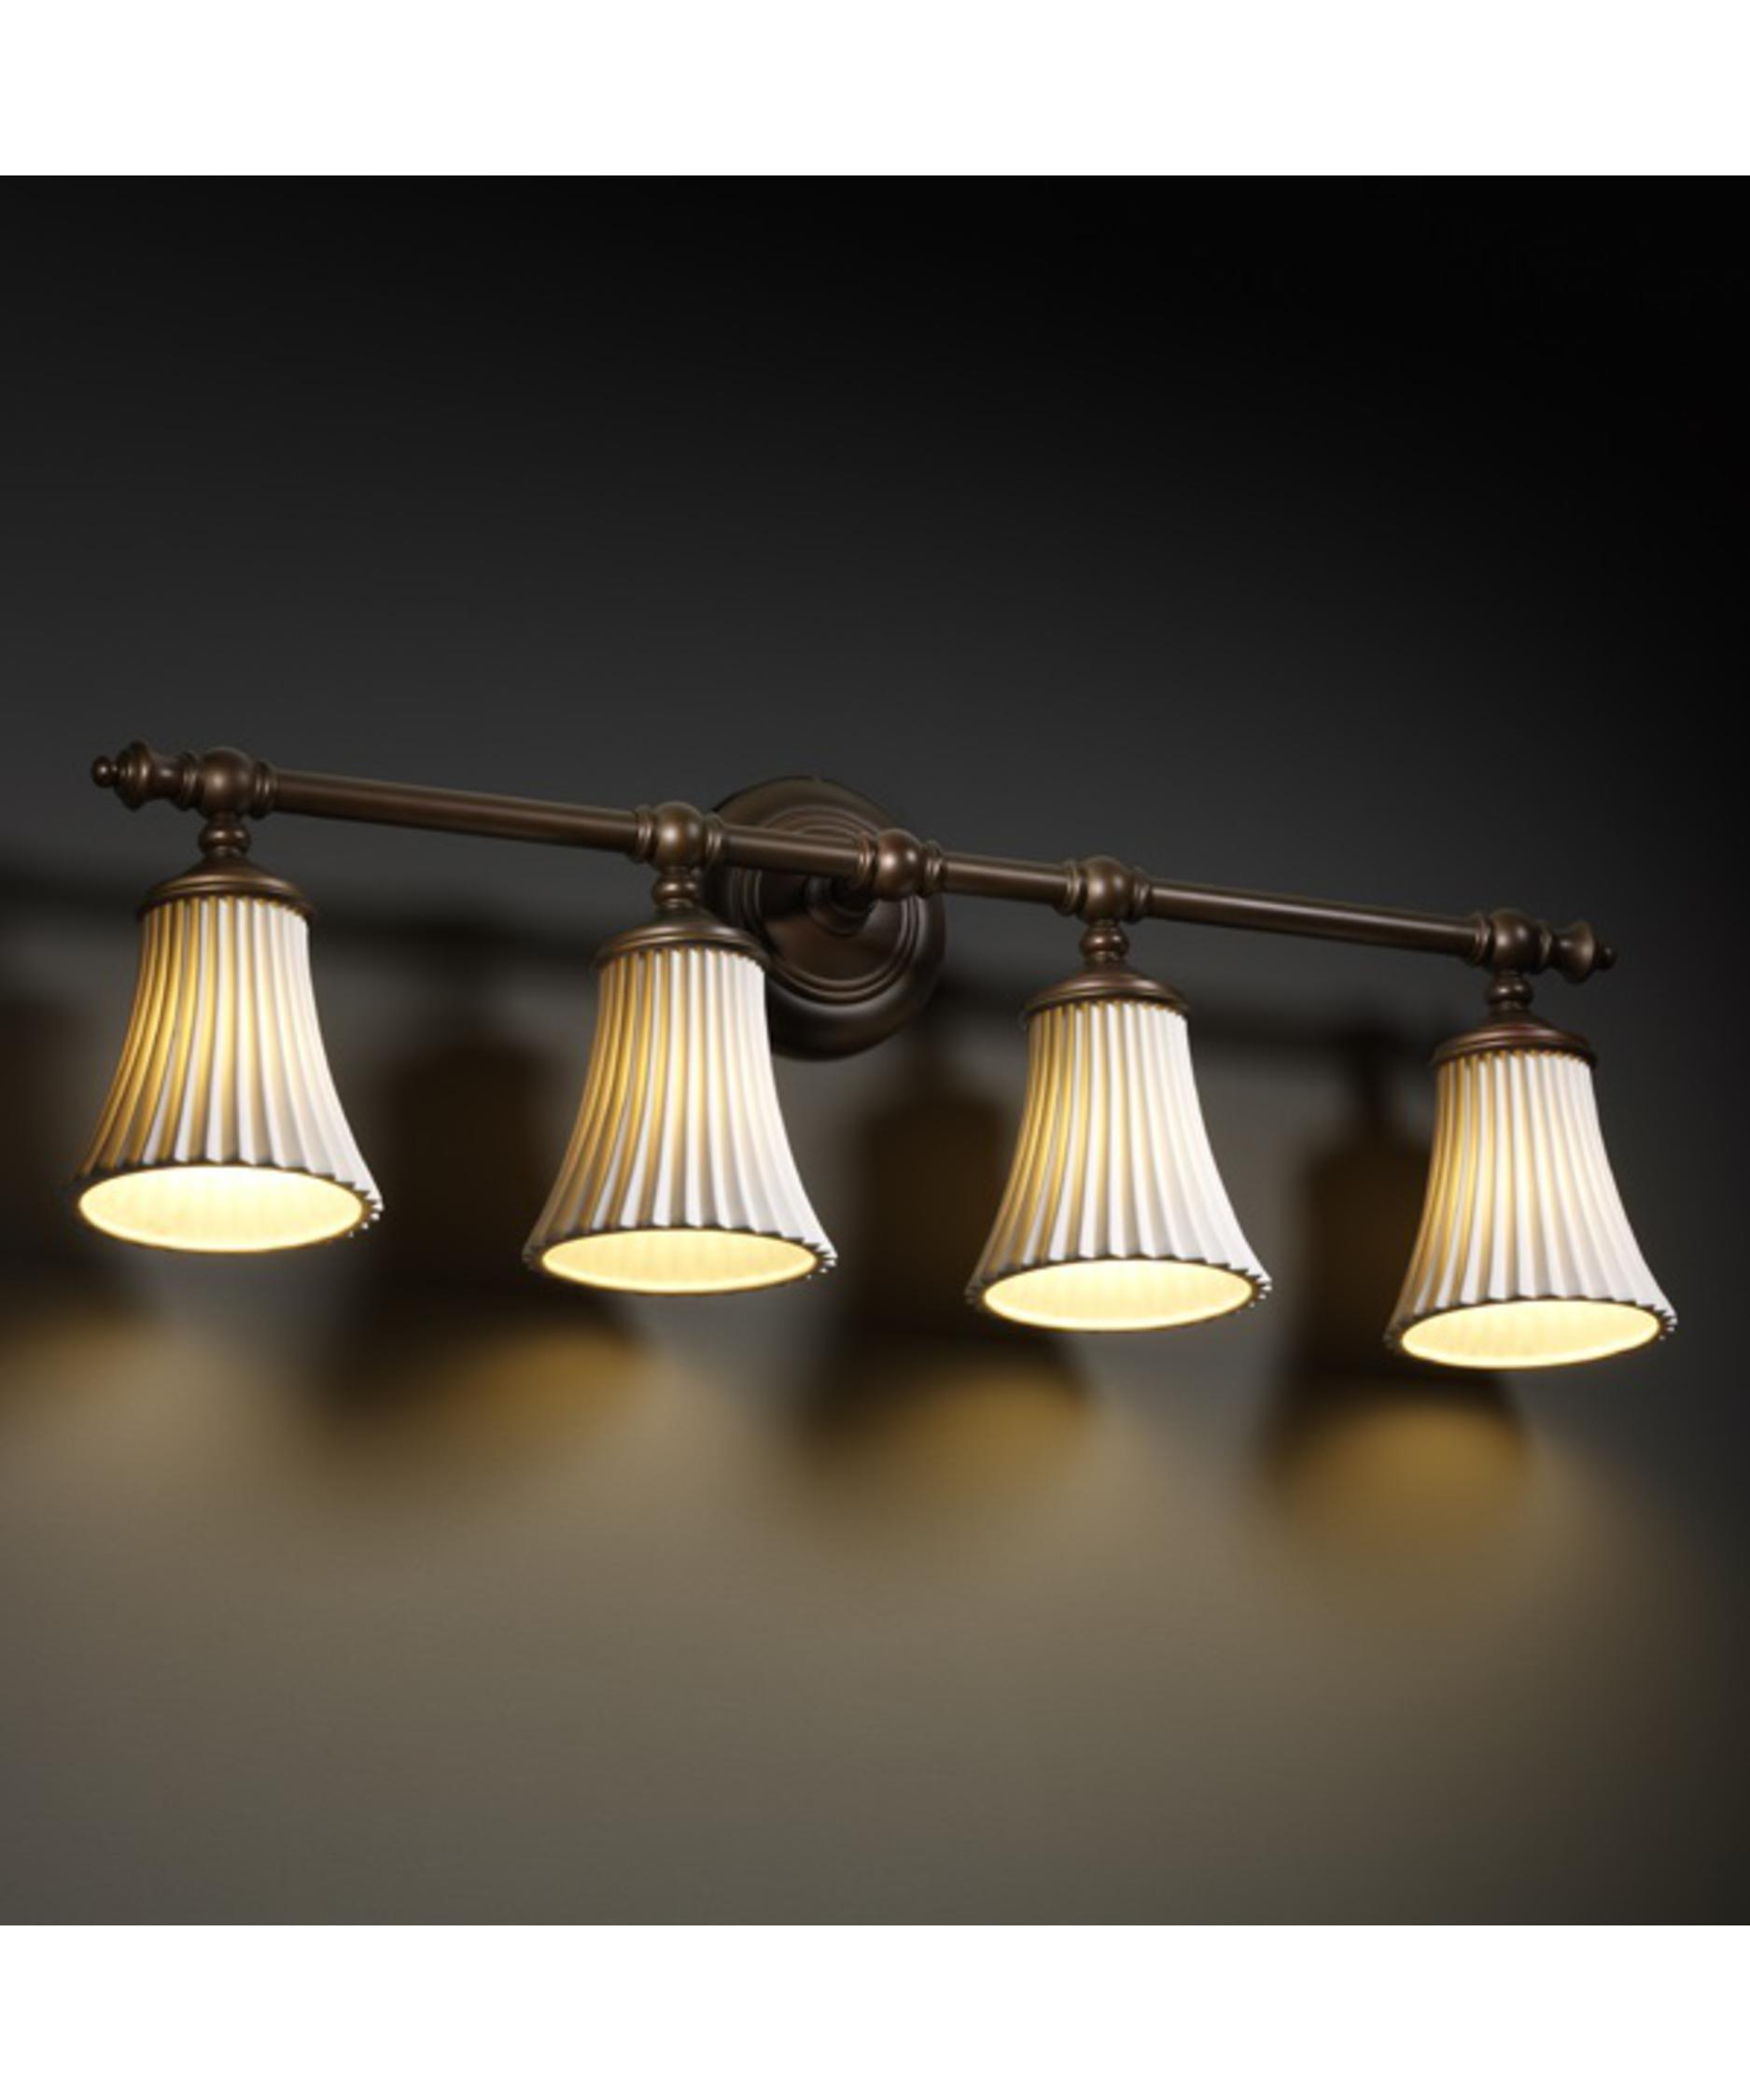 Justice design group limoges tradition 31 inch bath vanity light capitol lighting 1 - Justice design group bathroom lighting ...